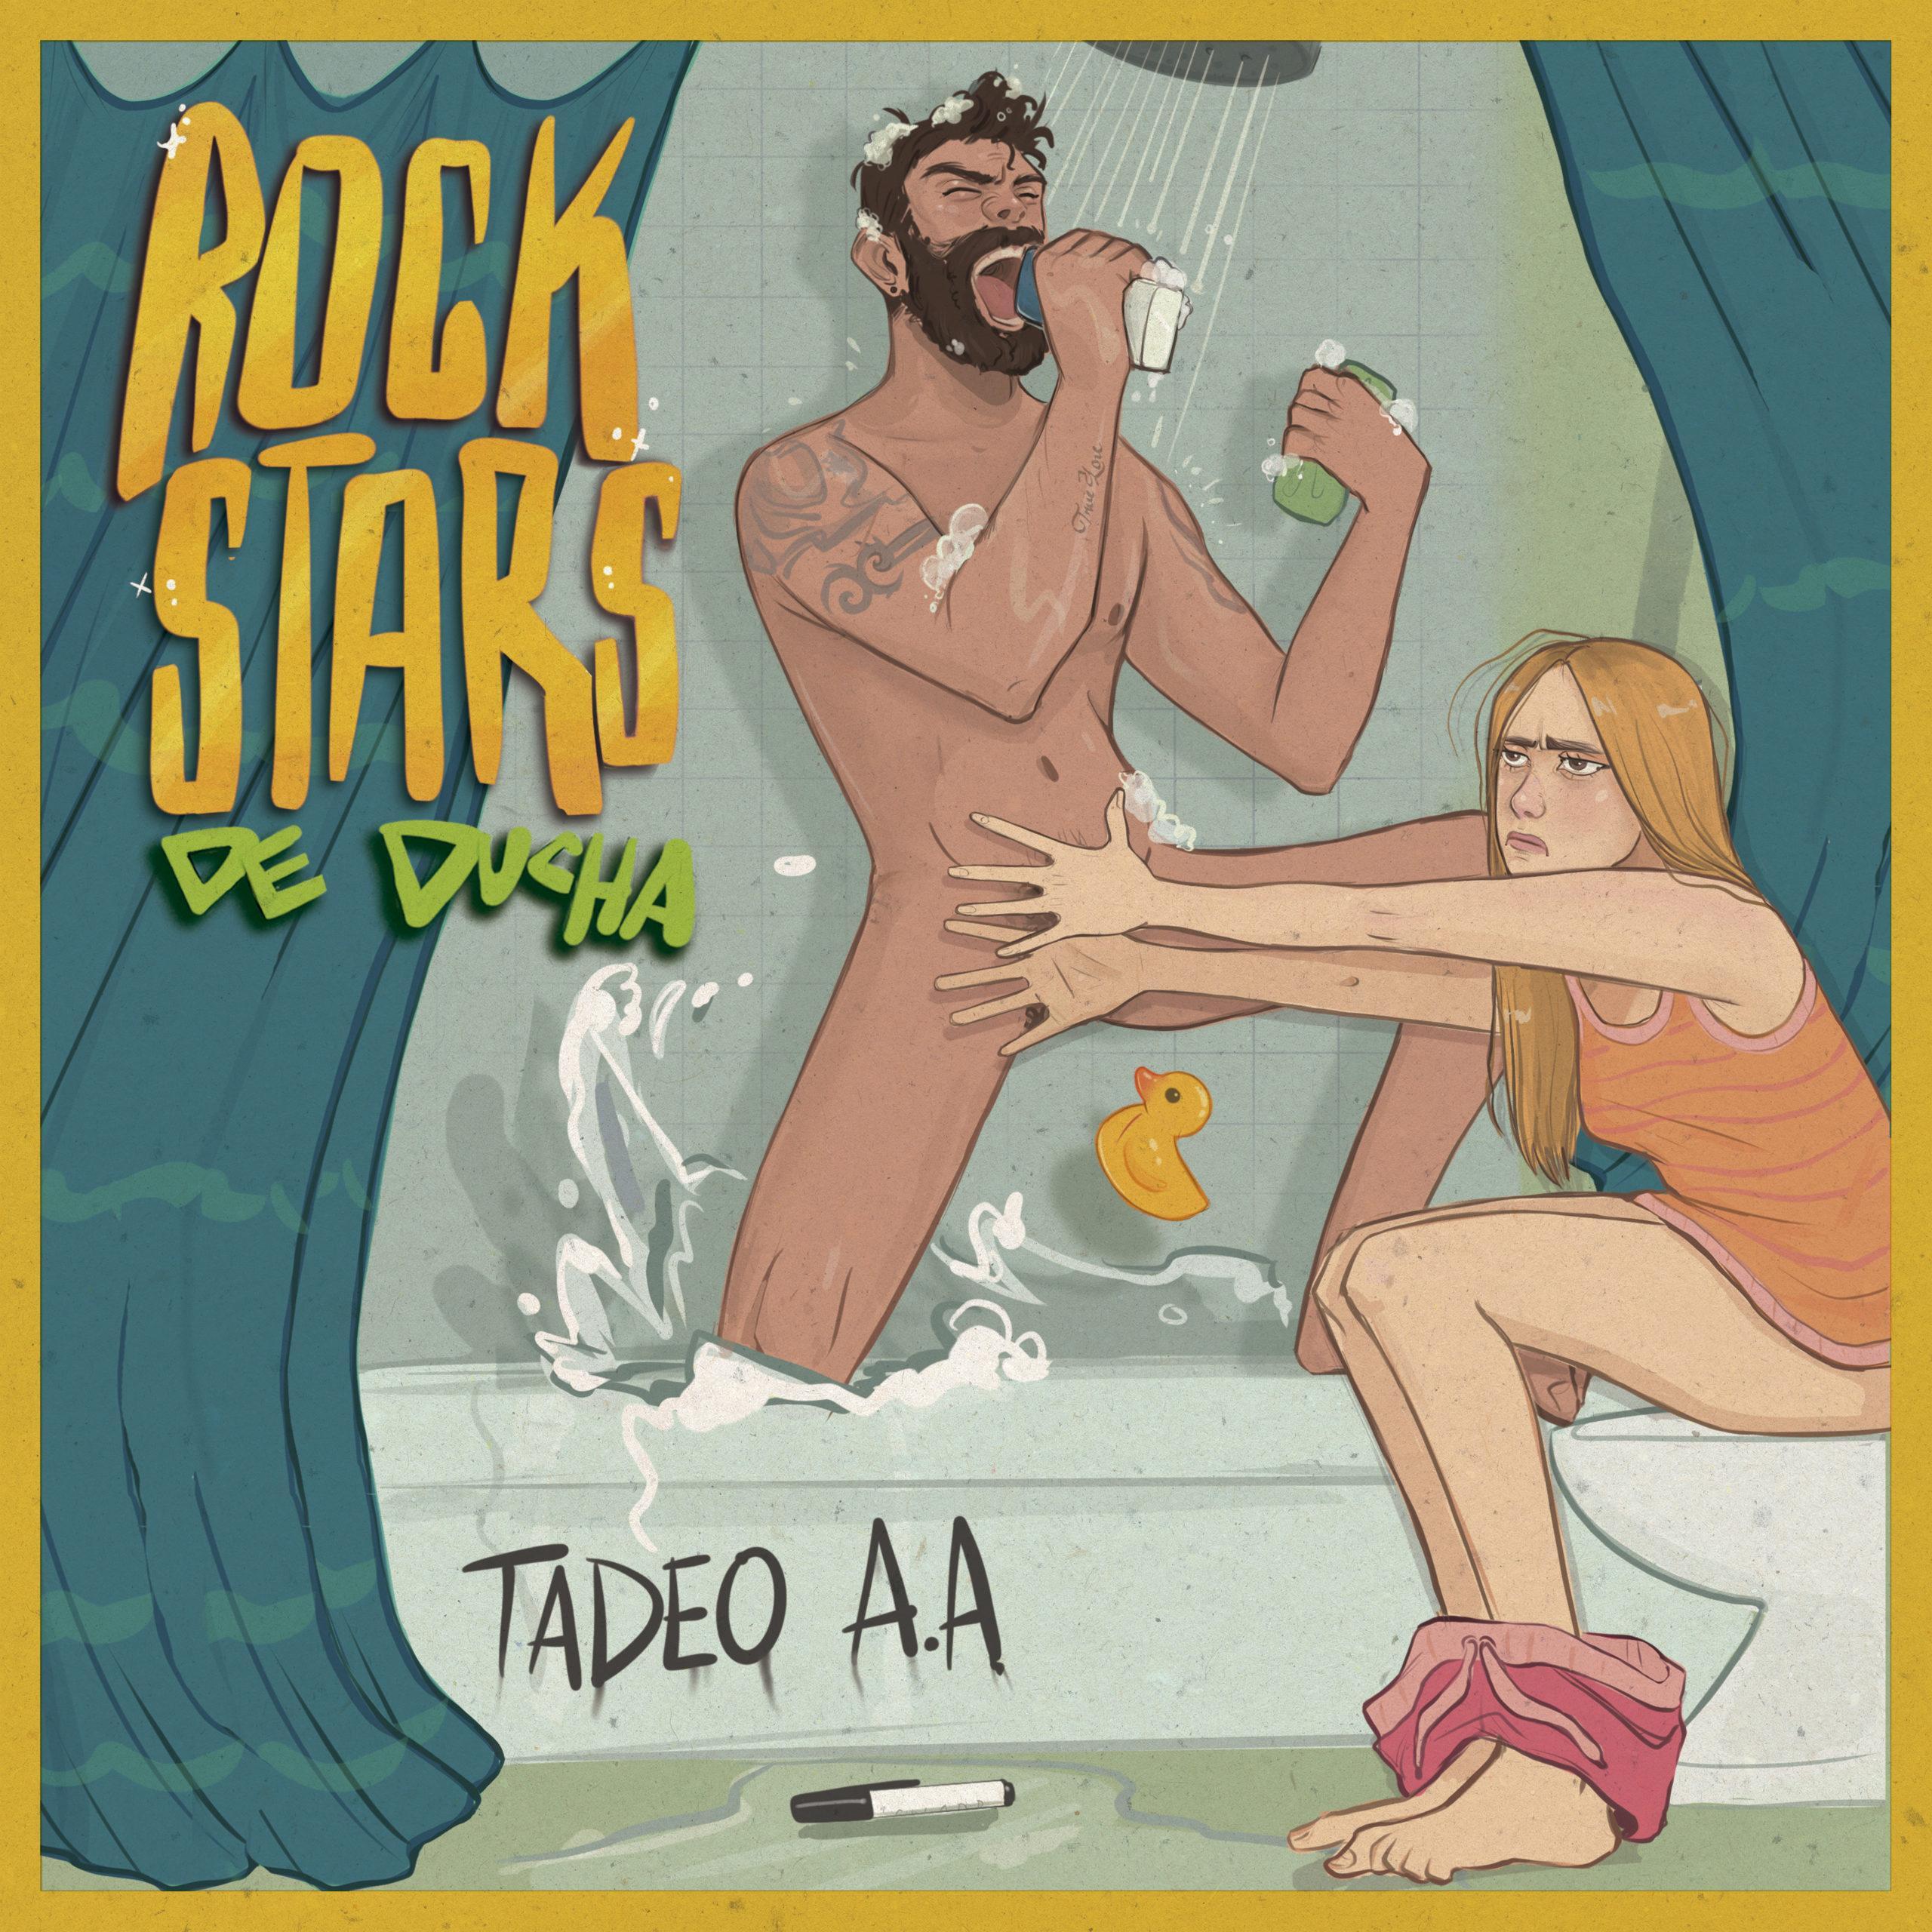 Tadeo AA - Rock Stars De Ducha